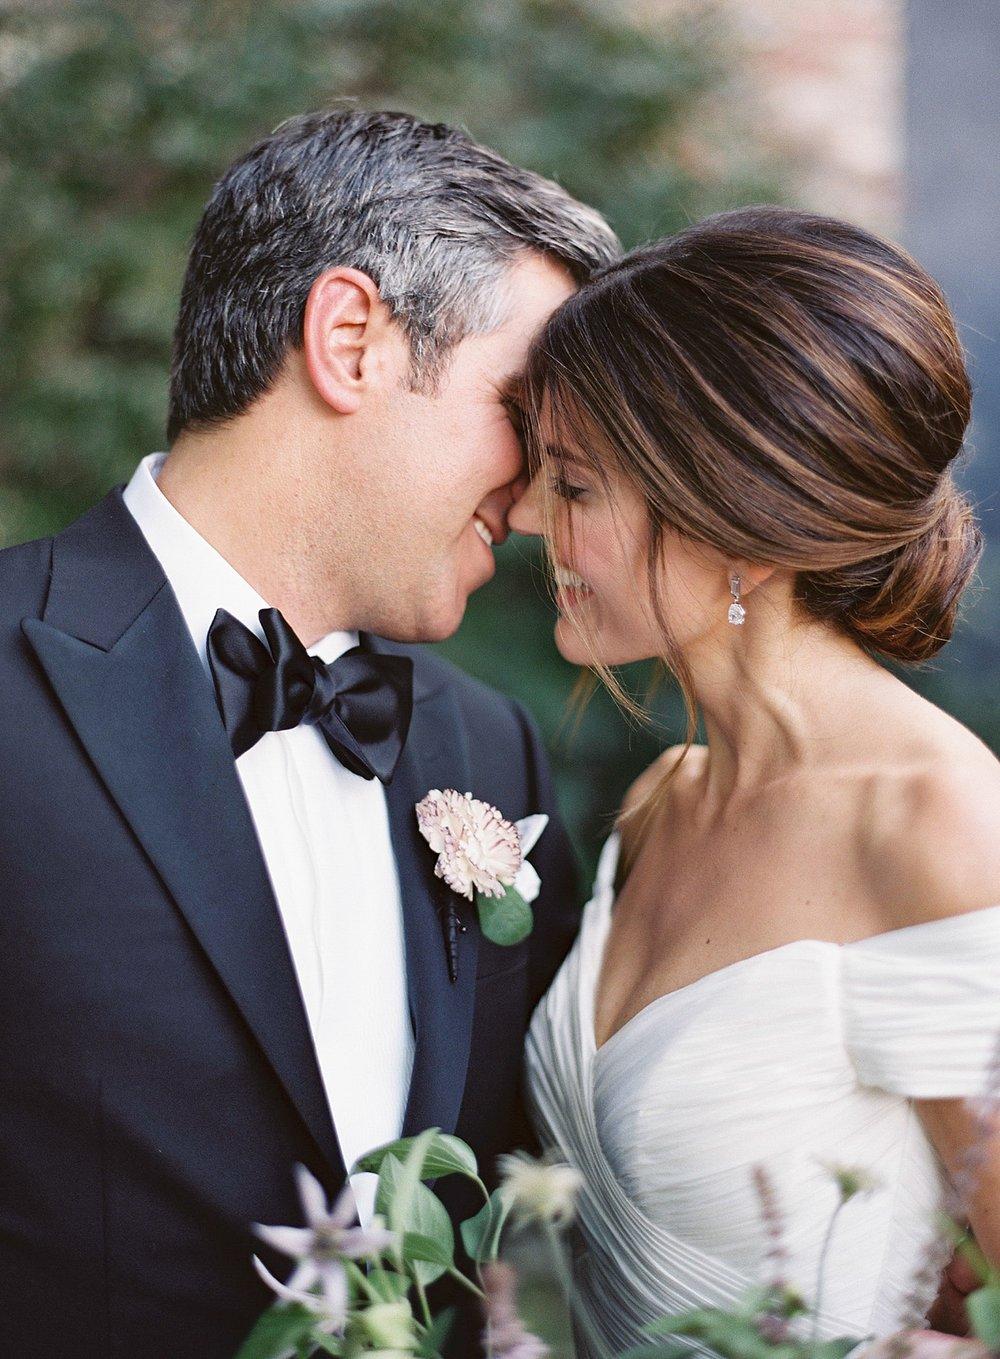 10_dewberry_charleston_wedding.jpg